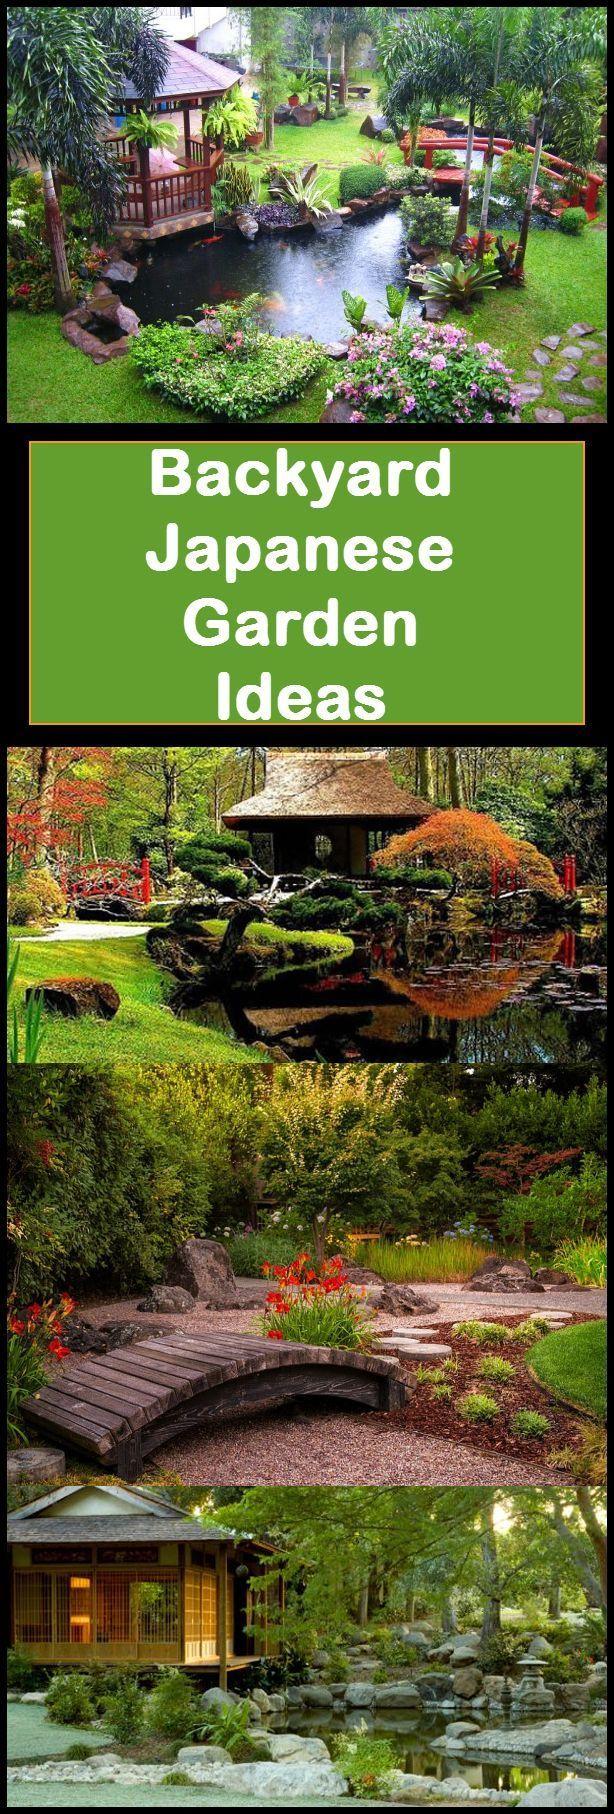 backyard garden ideas - DIY garden tips - beautiful backyards